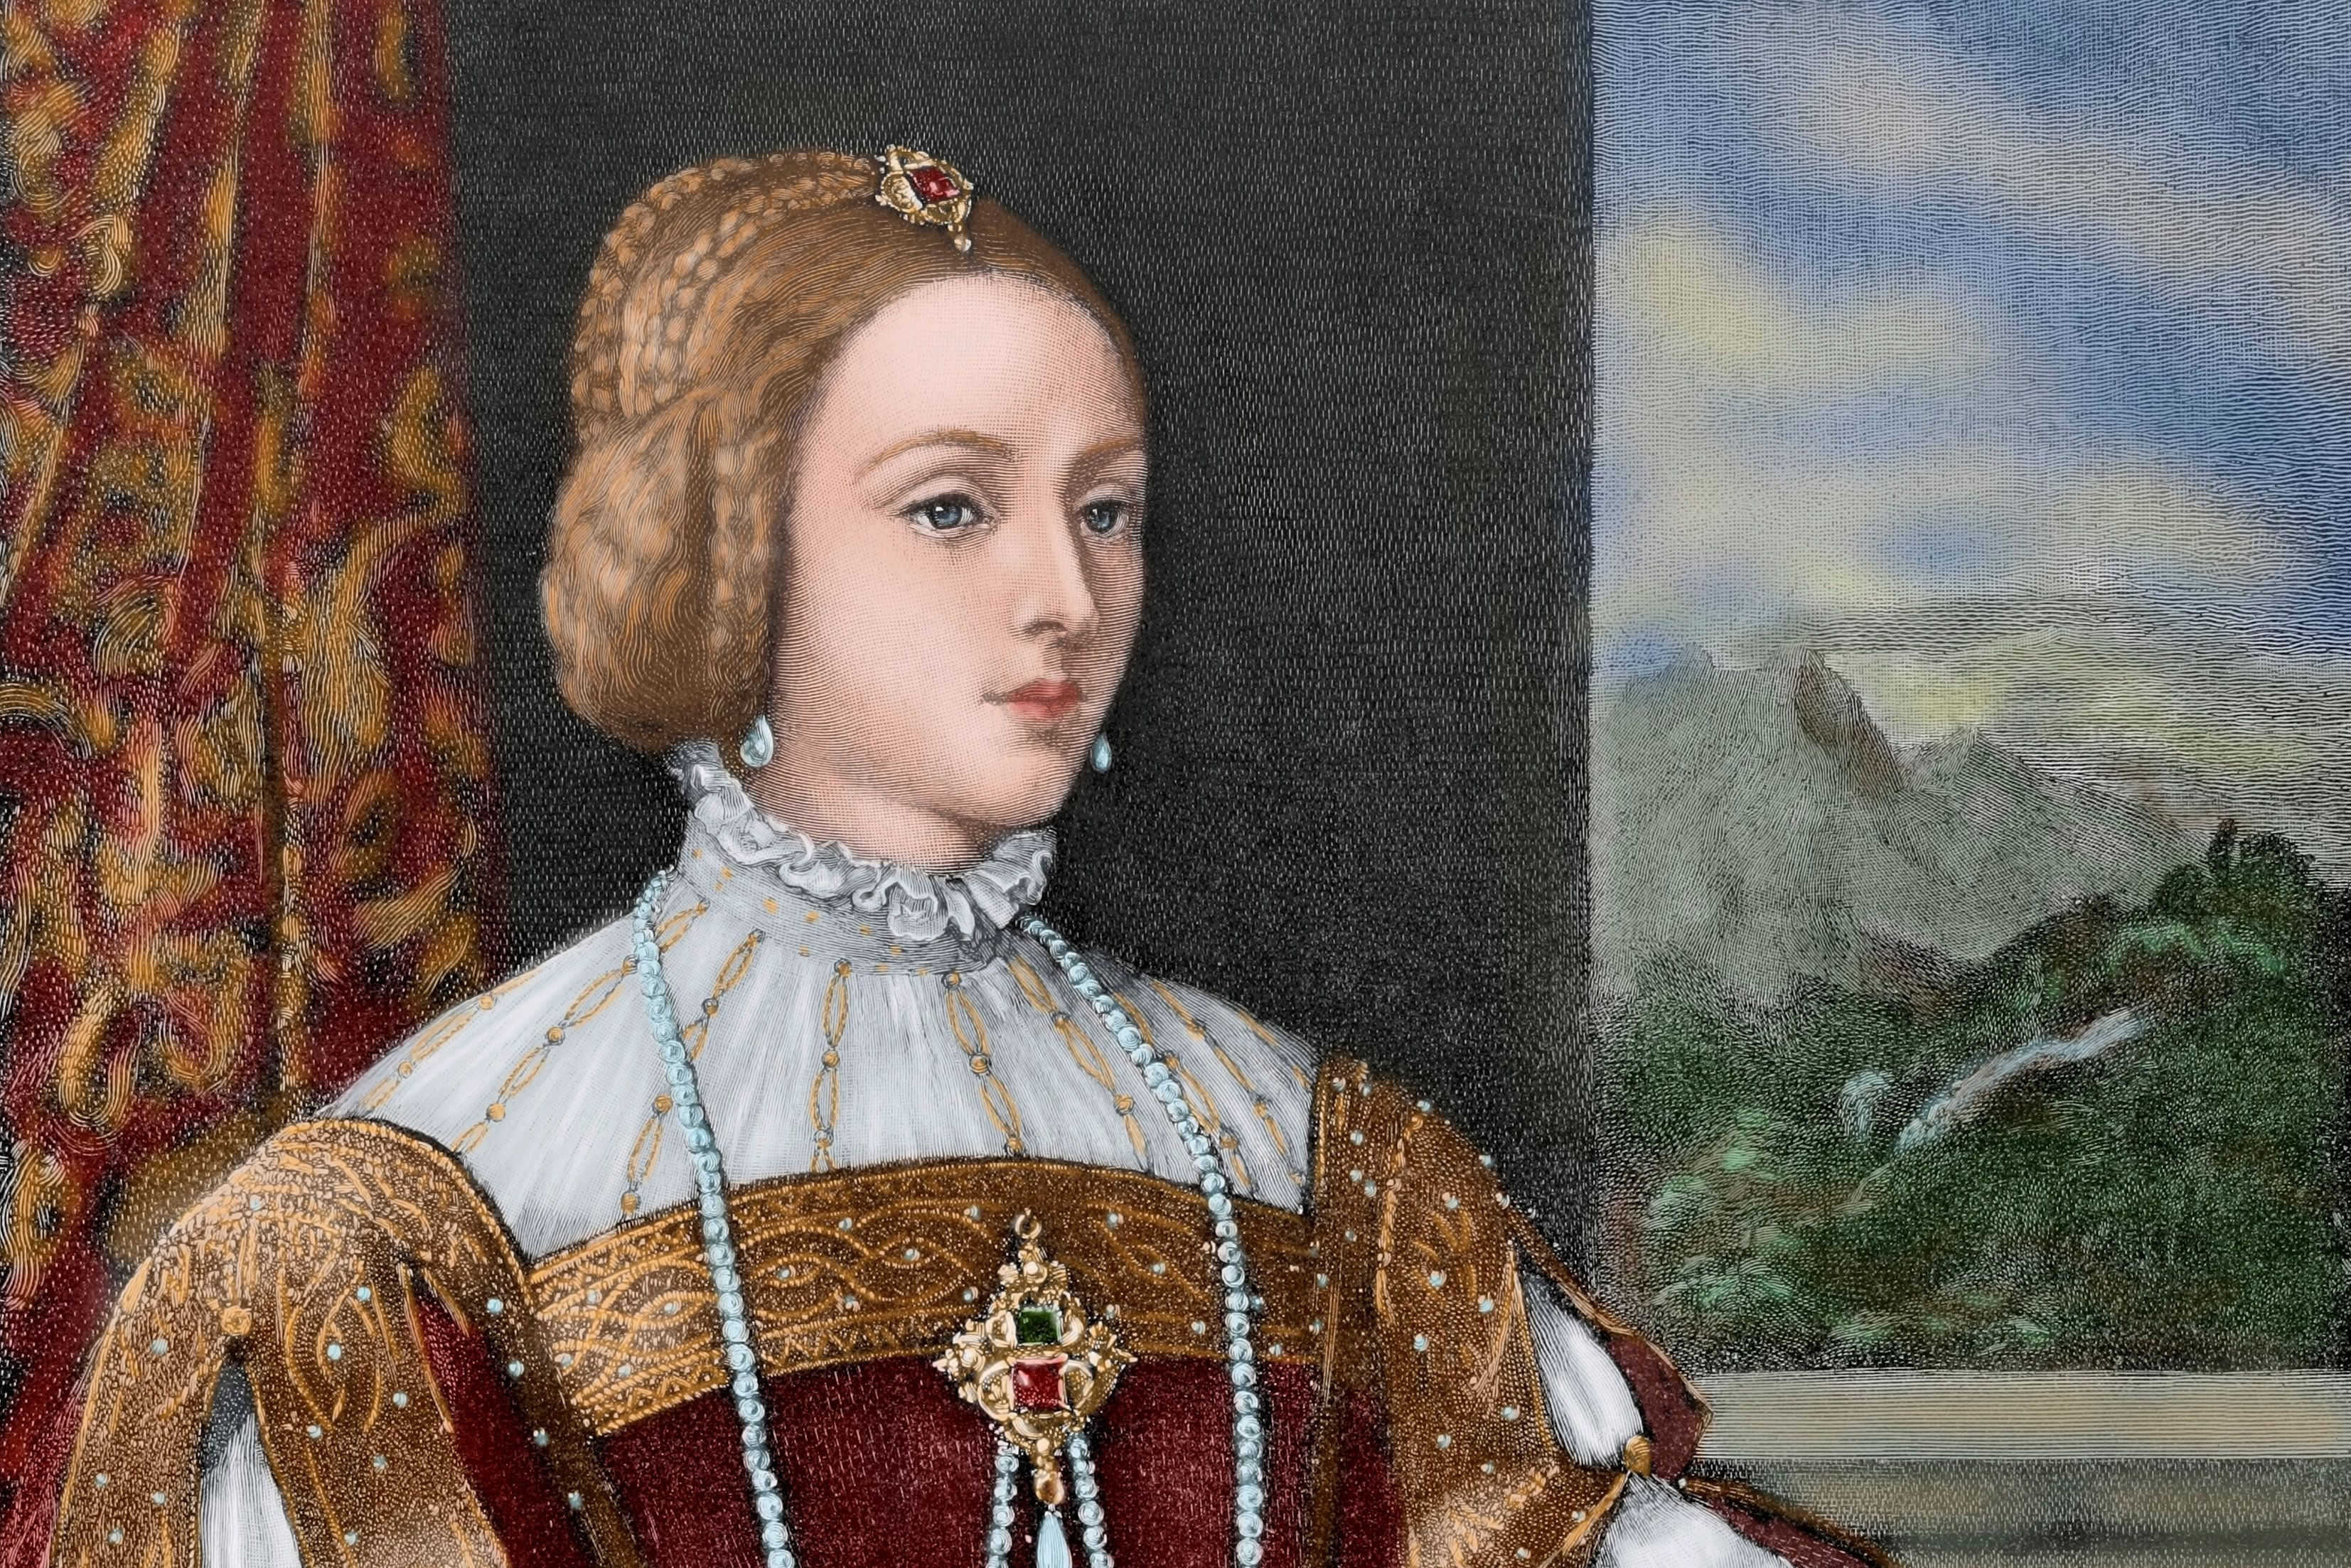 Isabella I queen of Spain